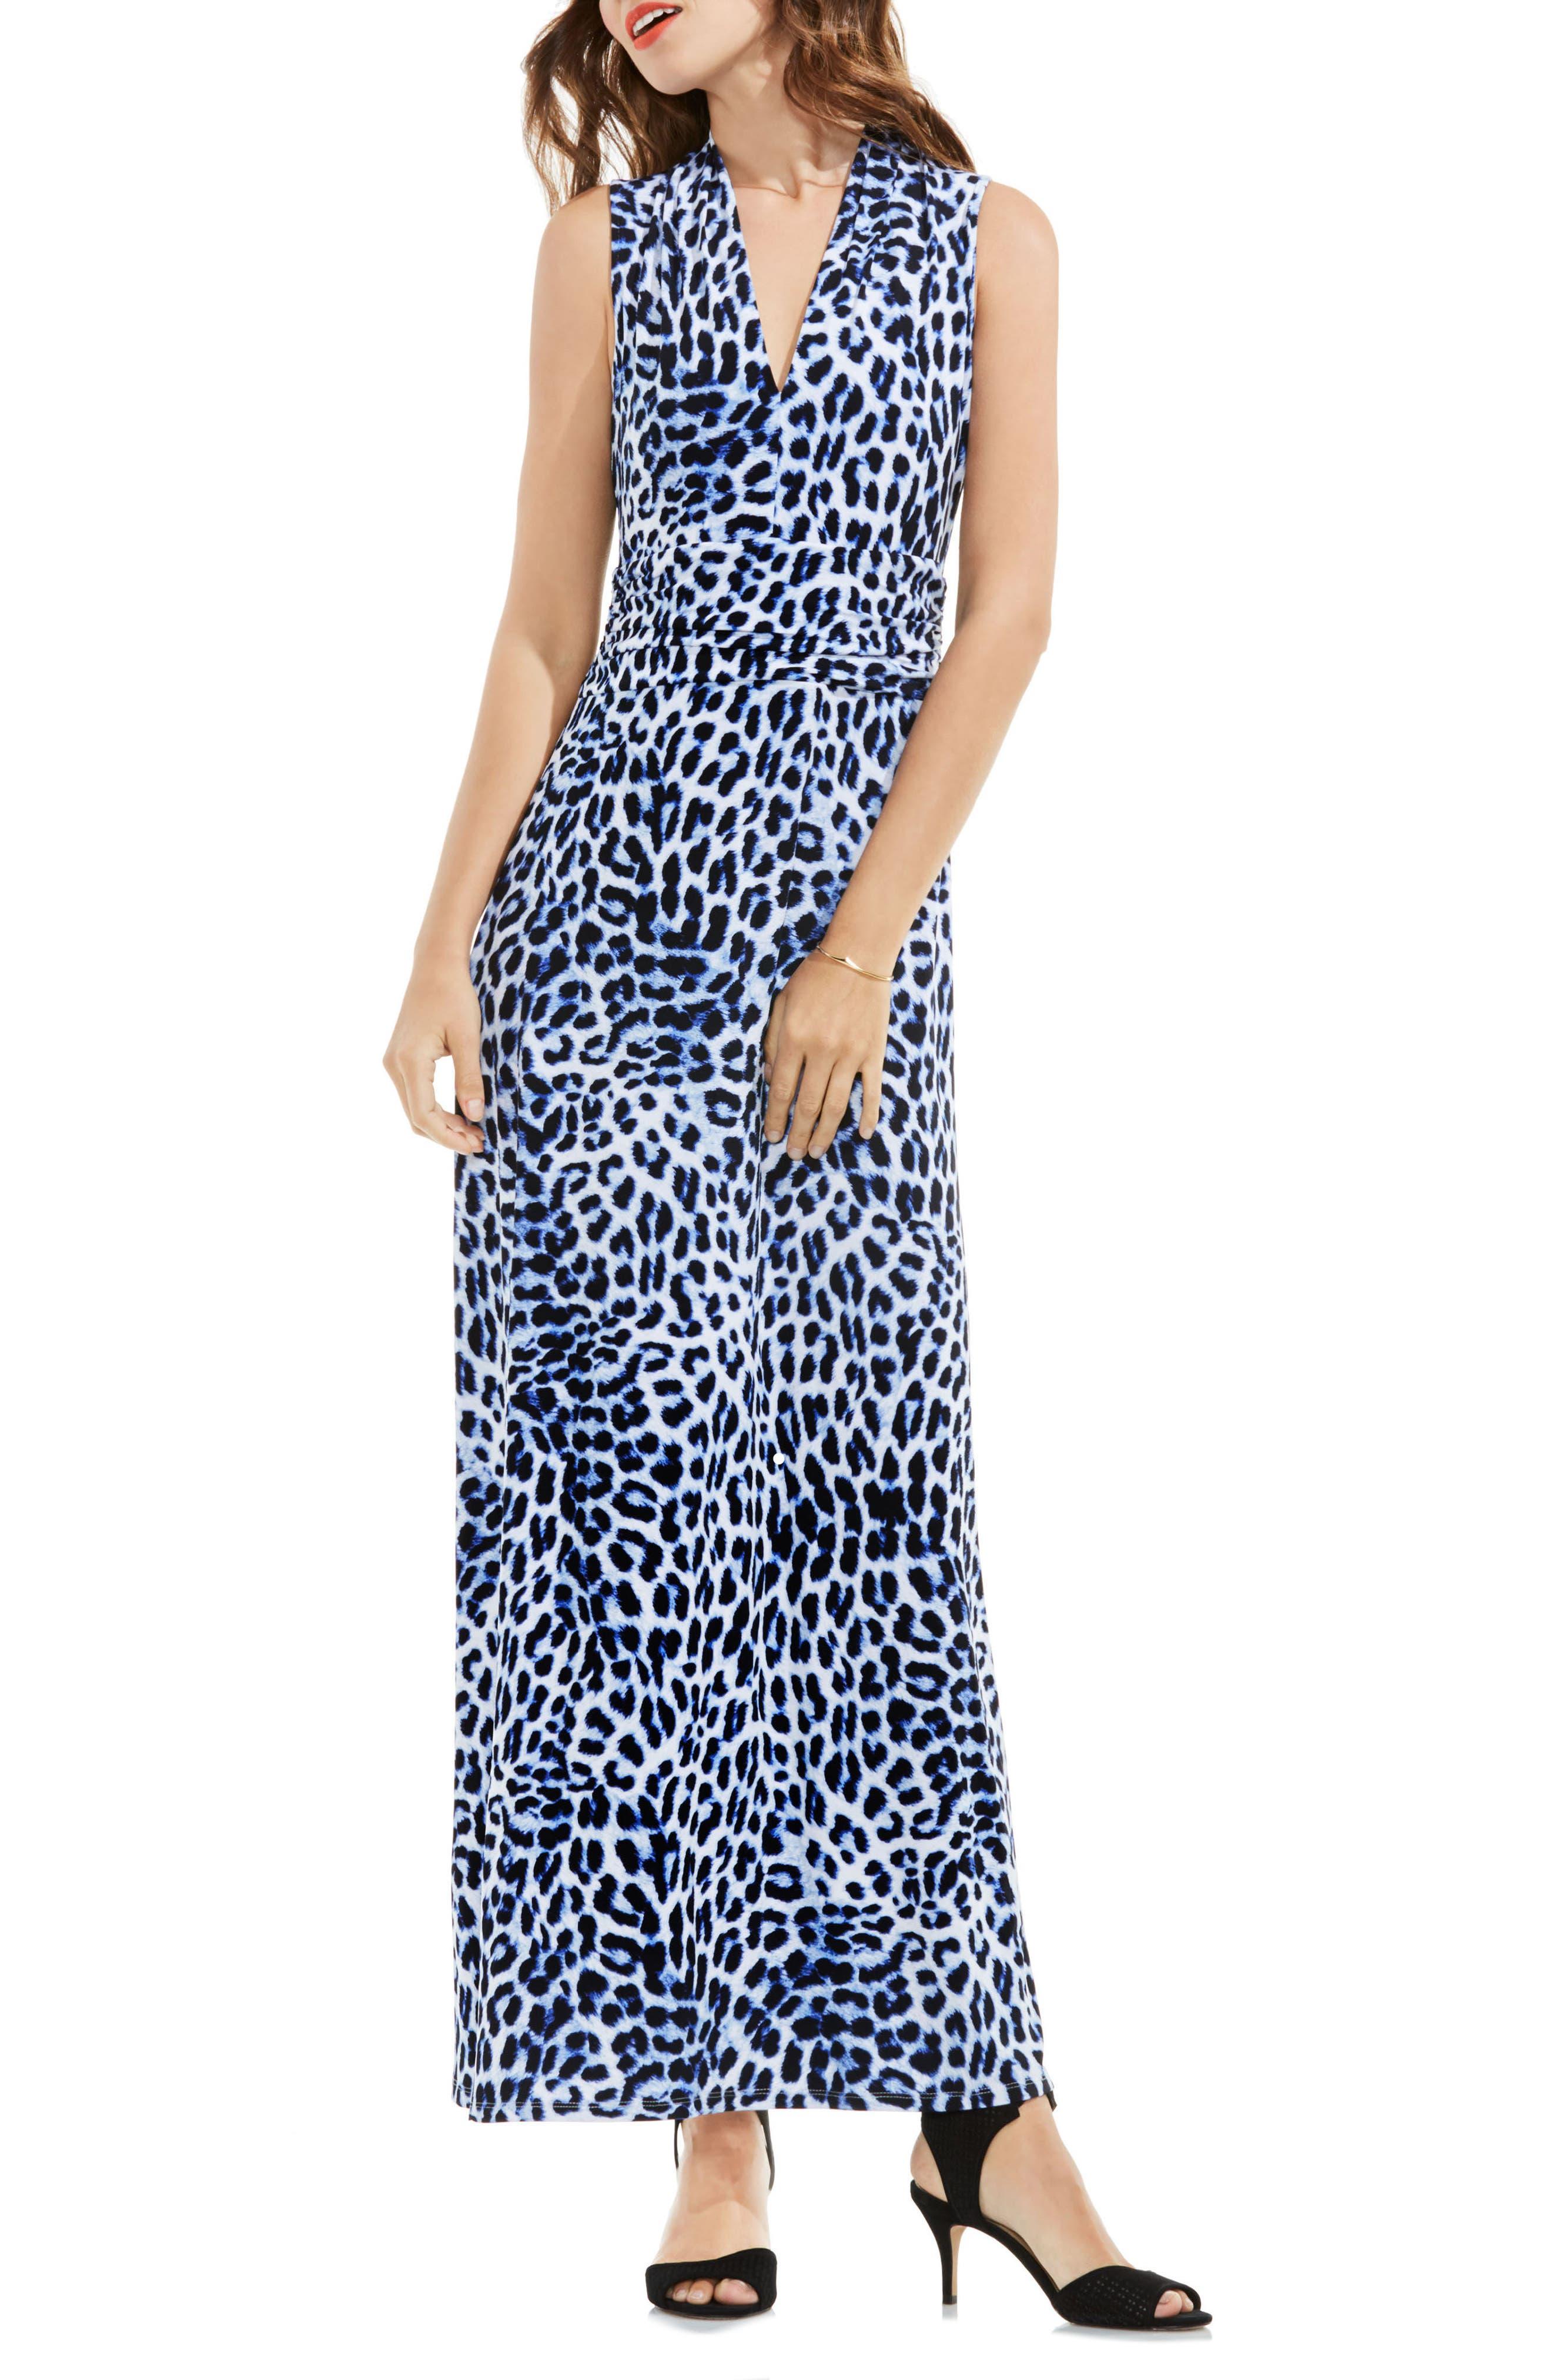 Vince Camuto Leopard Print Maxi Dress